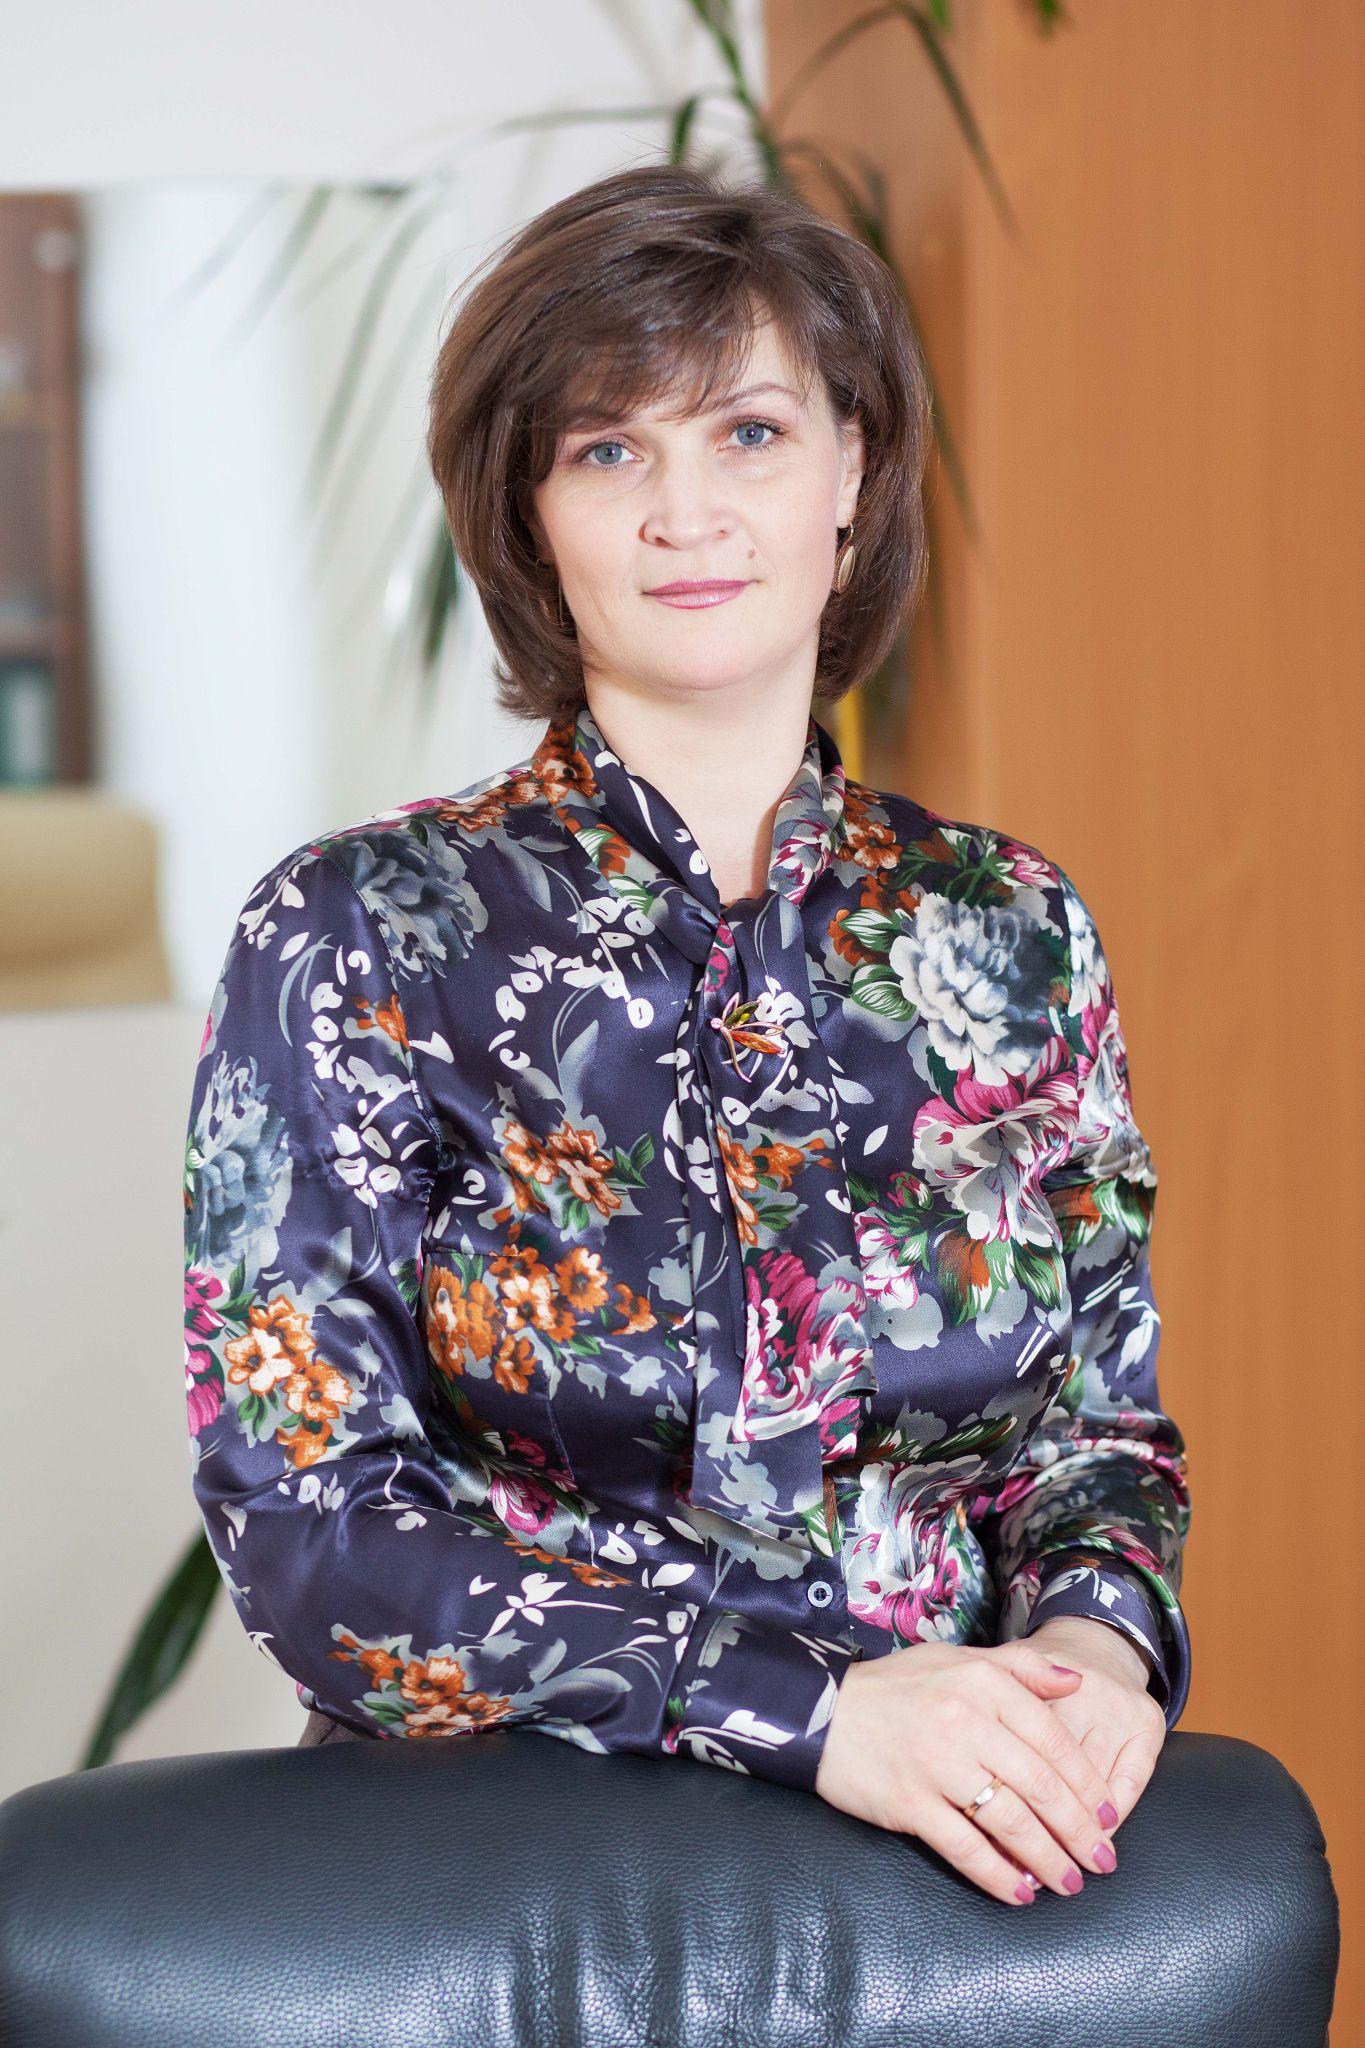 Караченцева Татьяна Анатольевна